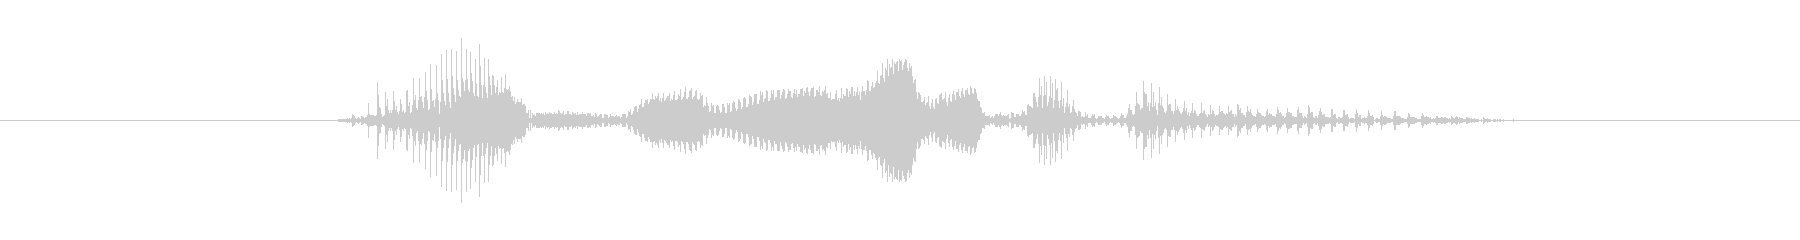 Unbelievable(テンション低)の未再生の波形